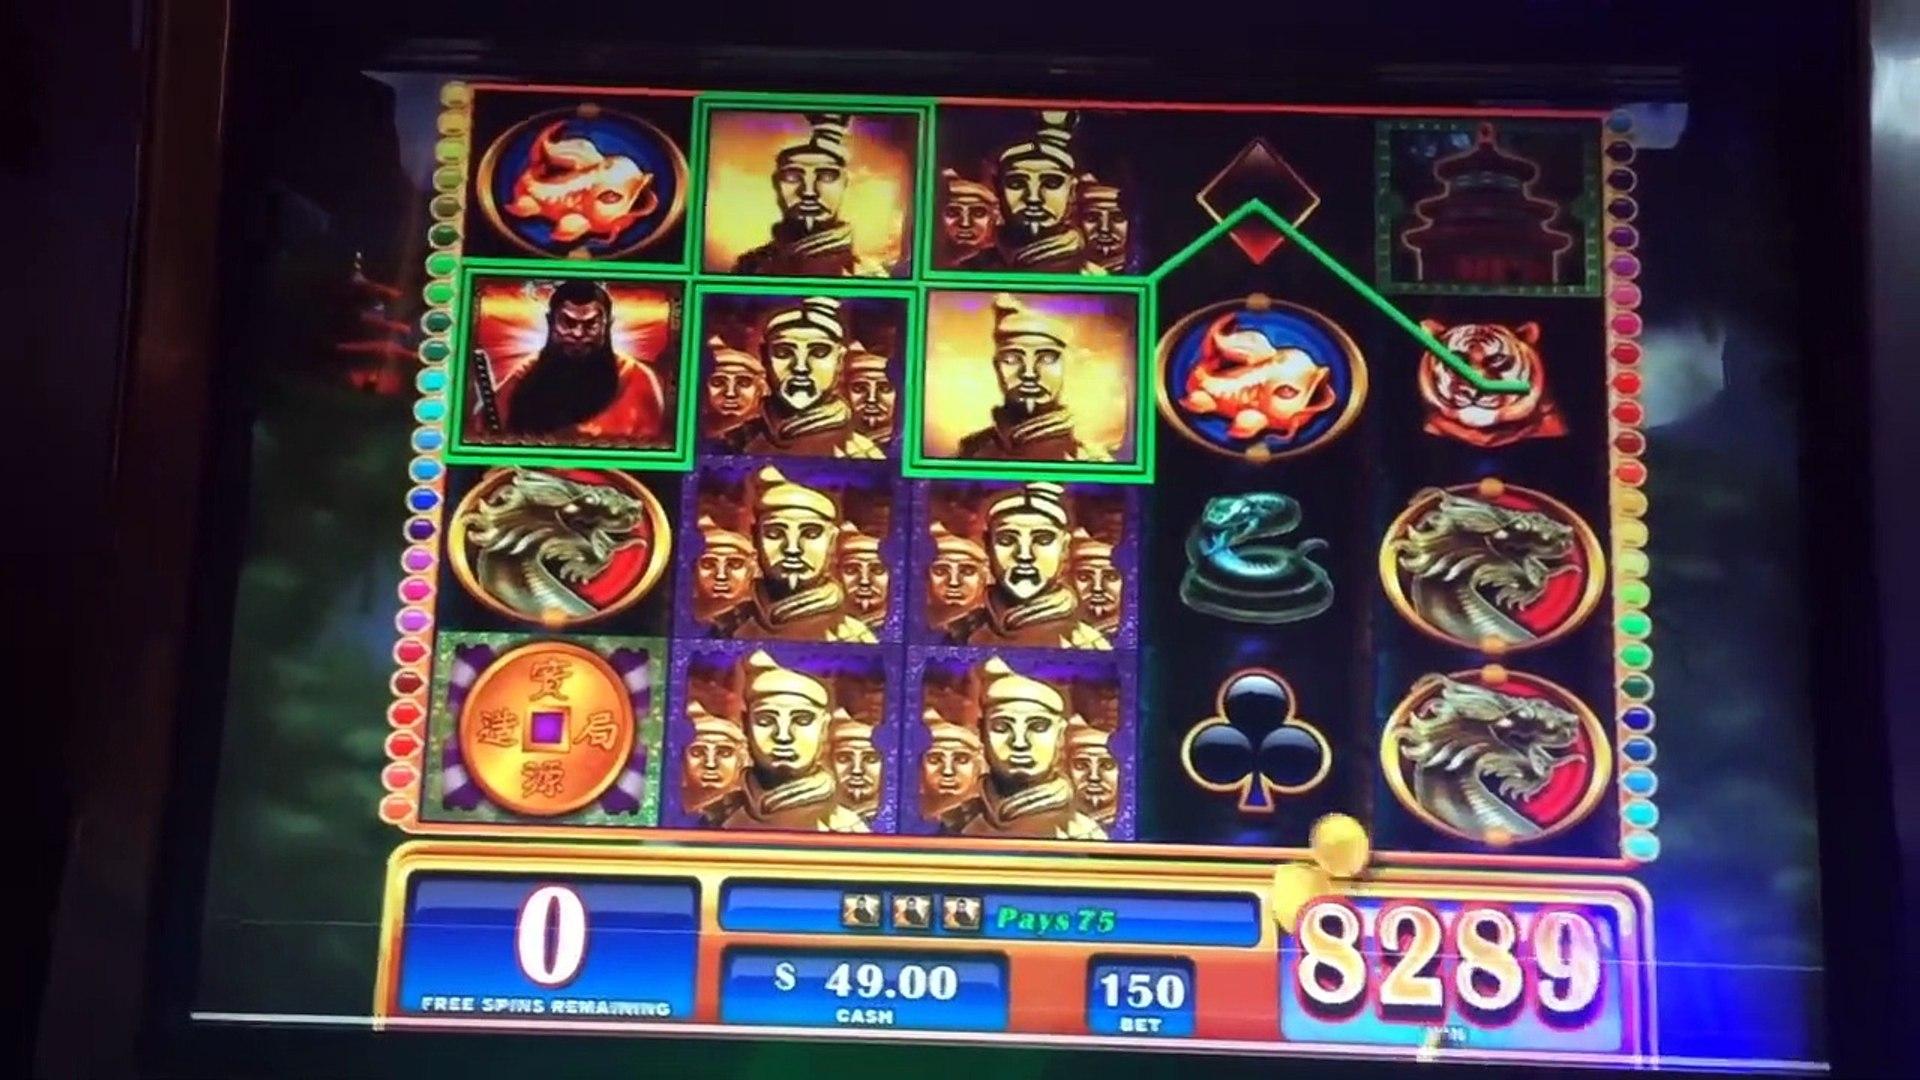 $100,000.00 In Slot Machine Wins! Casino